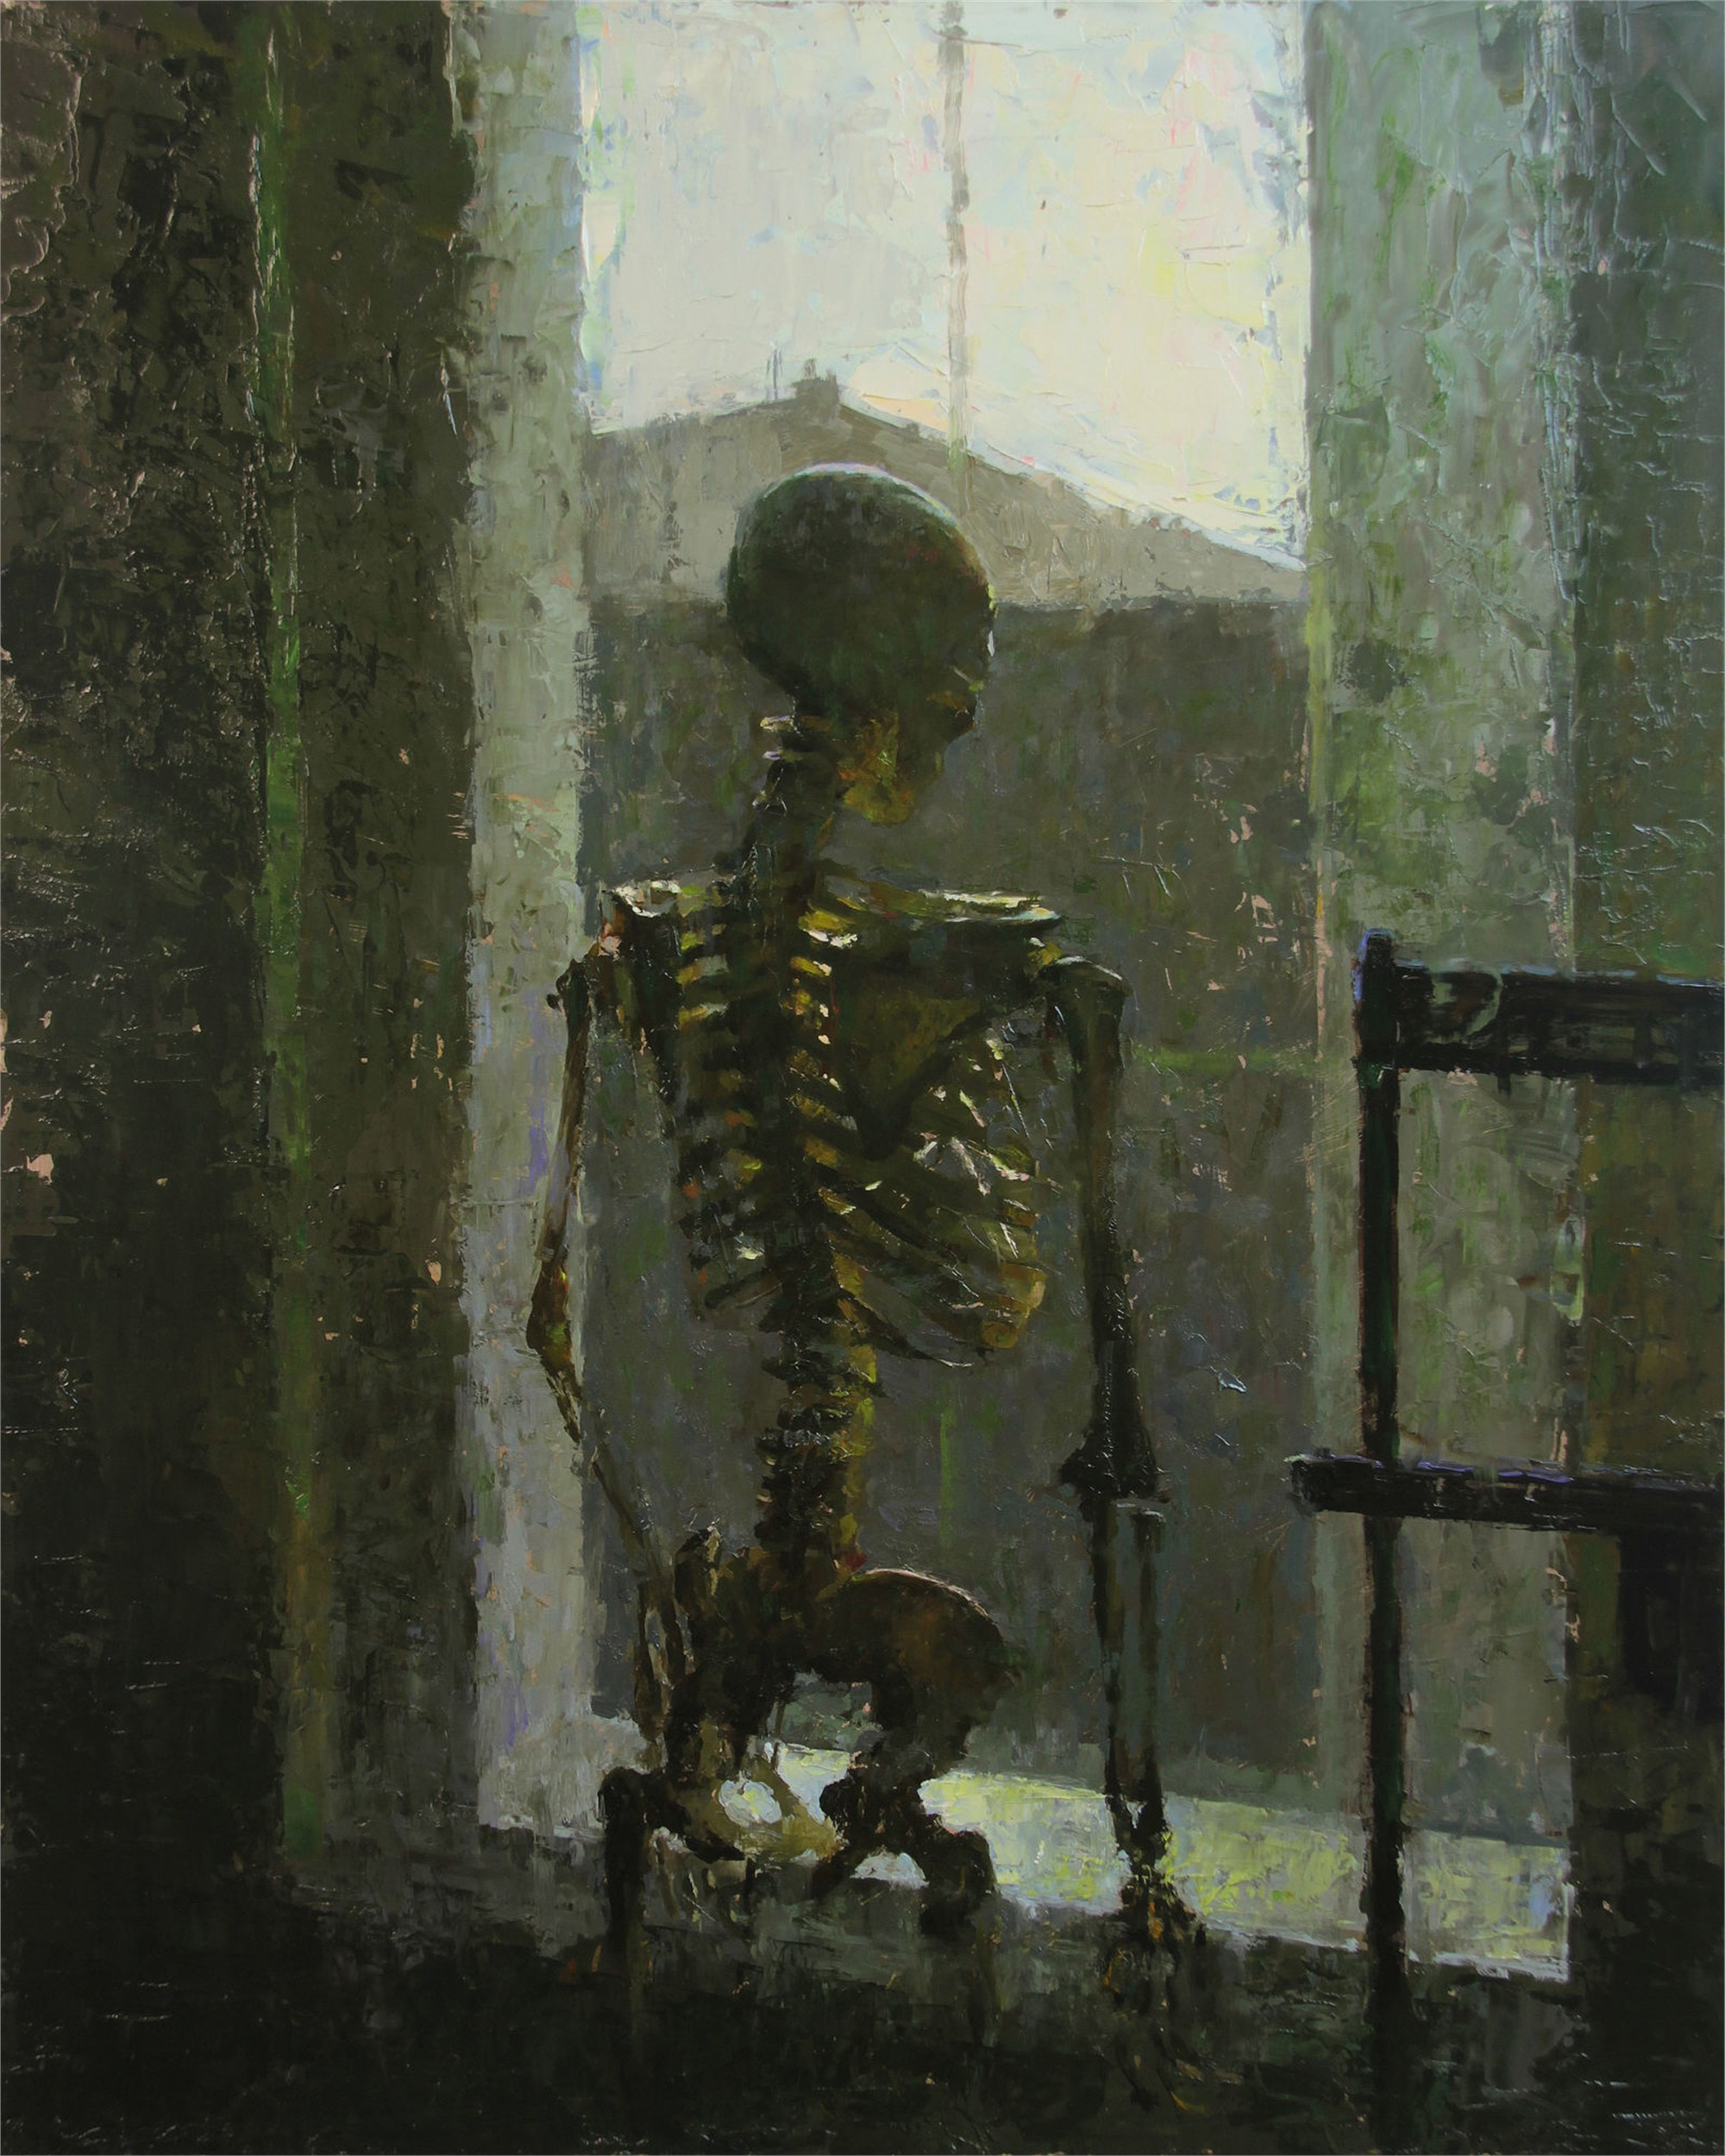 The Empty Room by Mia Bergeron